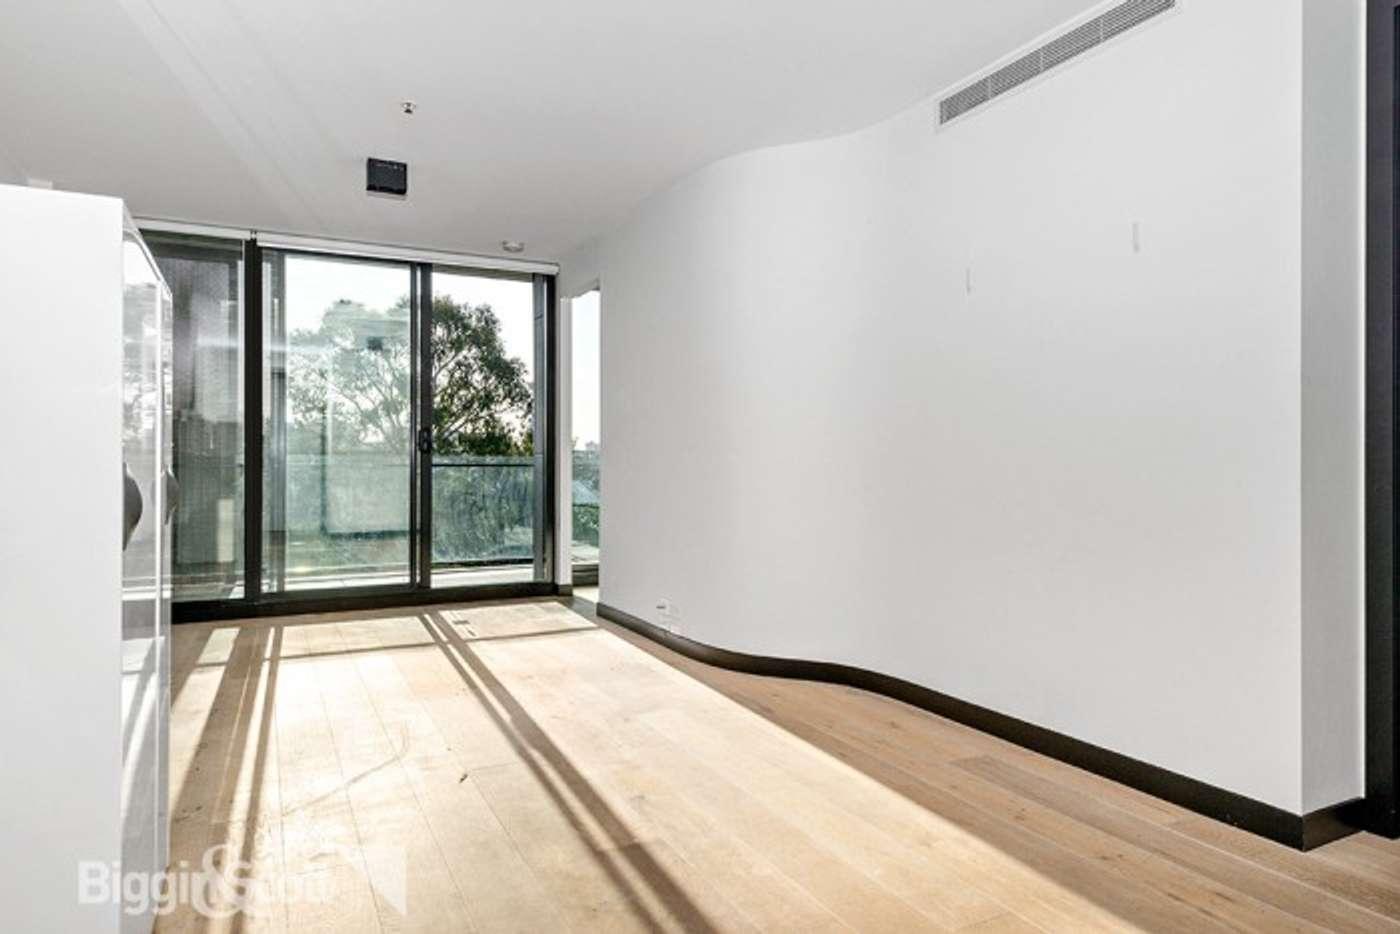 Main view of Homely apartment listing, 204/10 Porter Street, Prahran VIC 3181